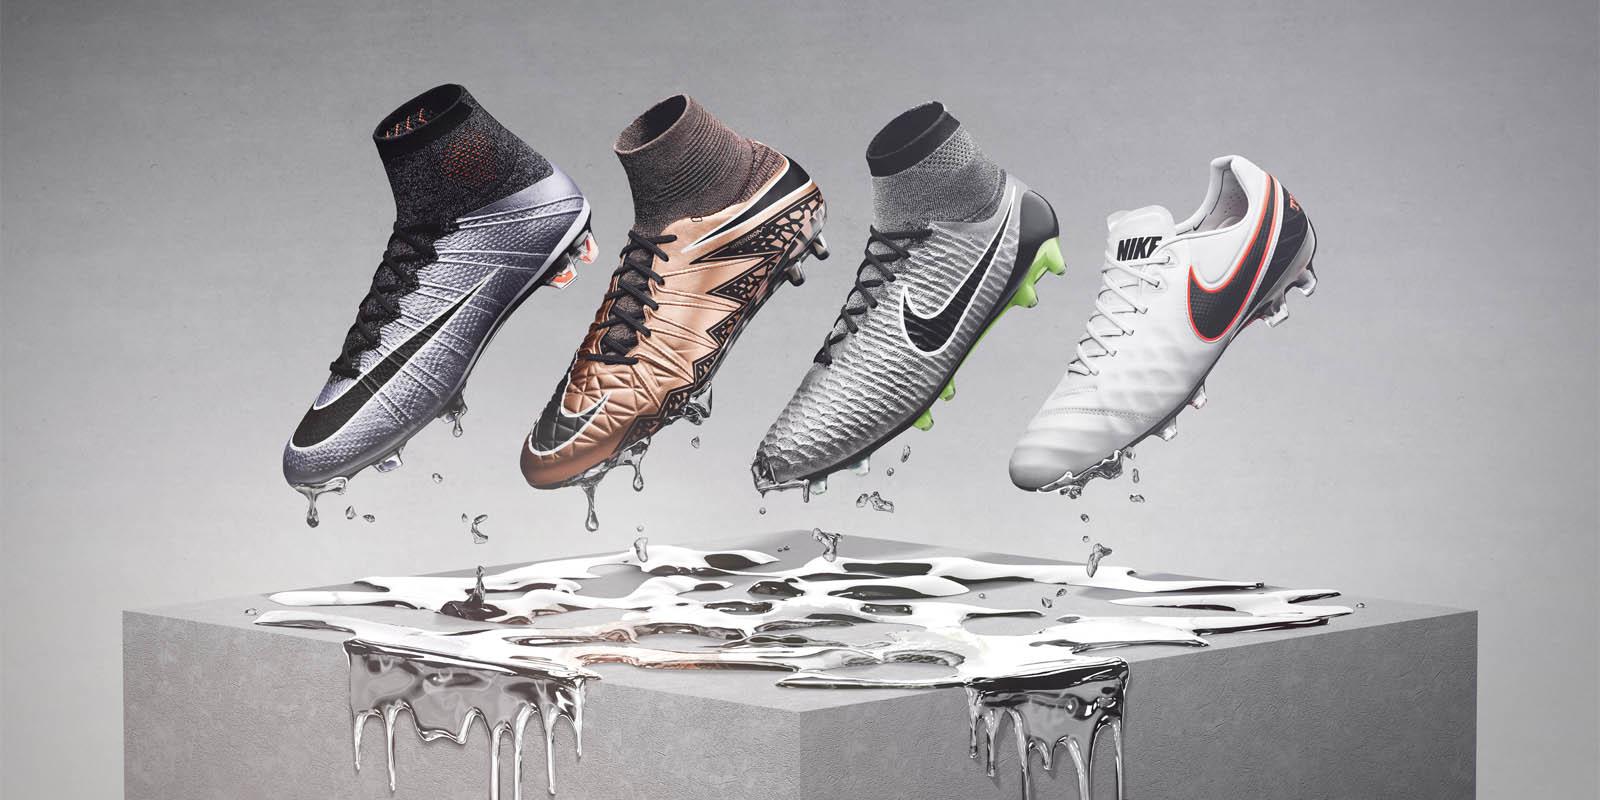 Produce Cambiarse de ropa Albardilla  Nike Liquid Chrome 2015-2016 Football Boots Pack Released - Footy Headlines